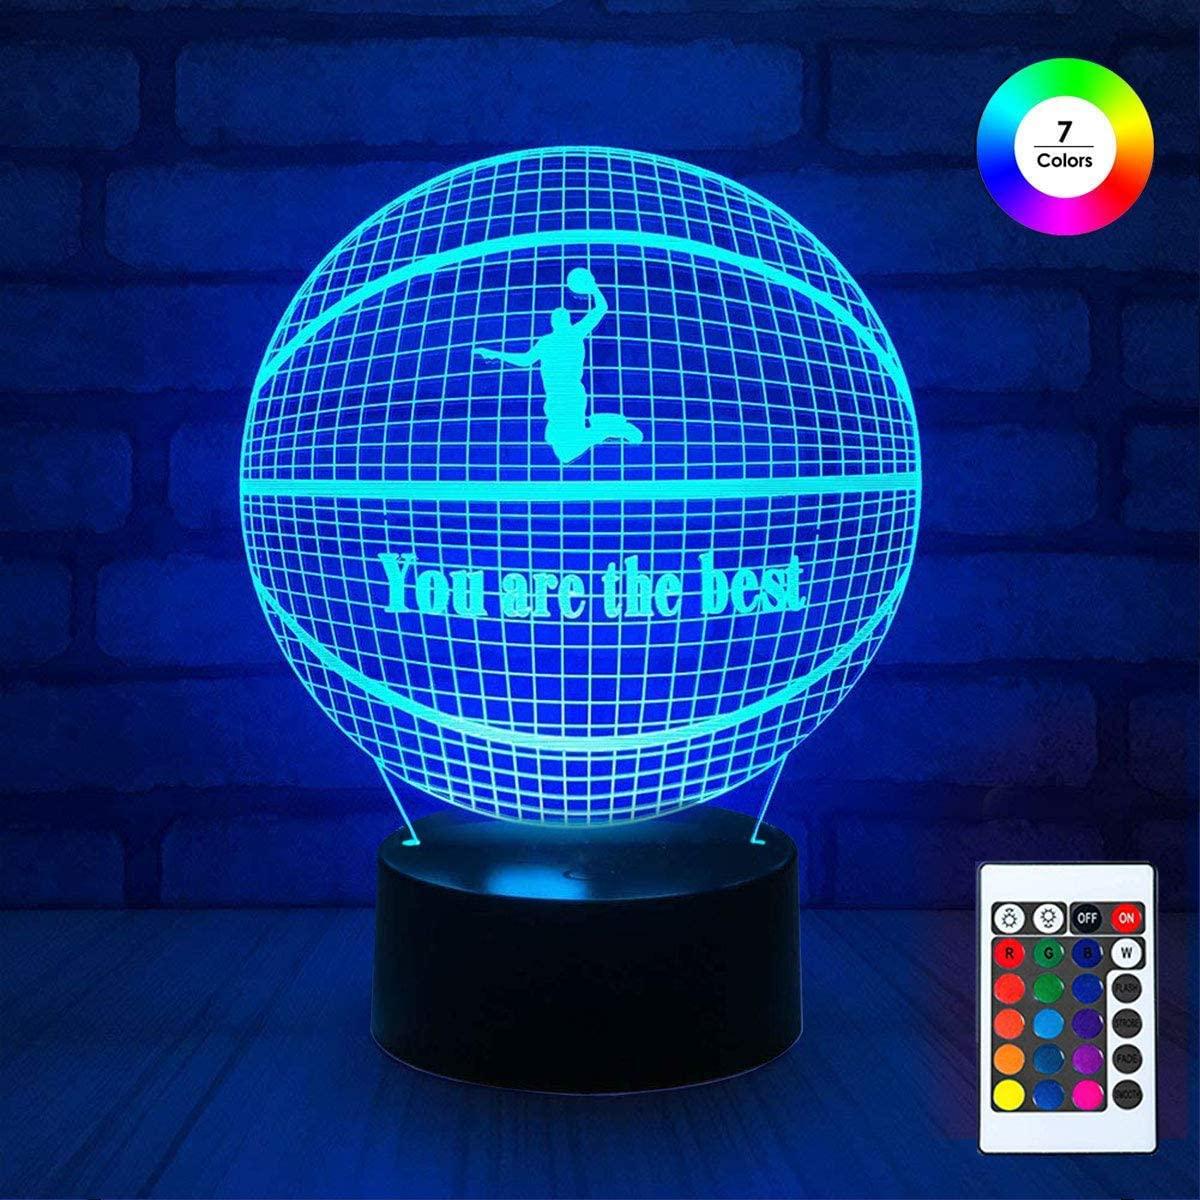 3D Remote Night Stand Light EpicGadget Optical Illusion Visualization LED Night Light Lamp 7 Colors Changing Remote Control Night Light Lamp Stand (Basketball)